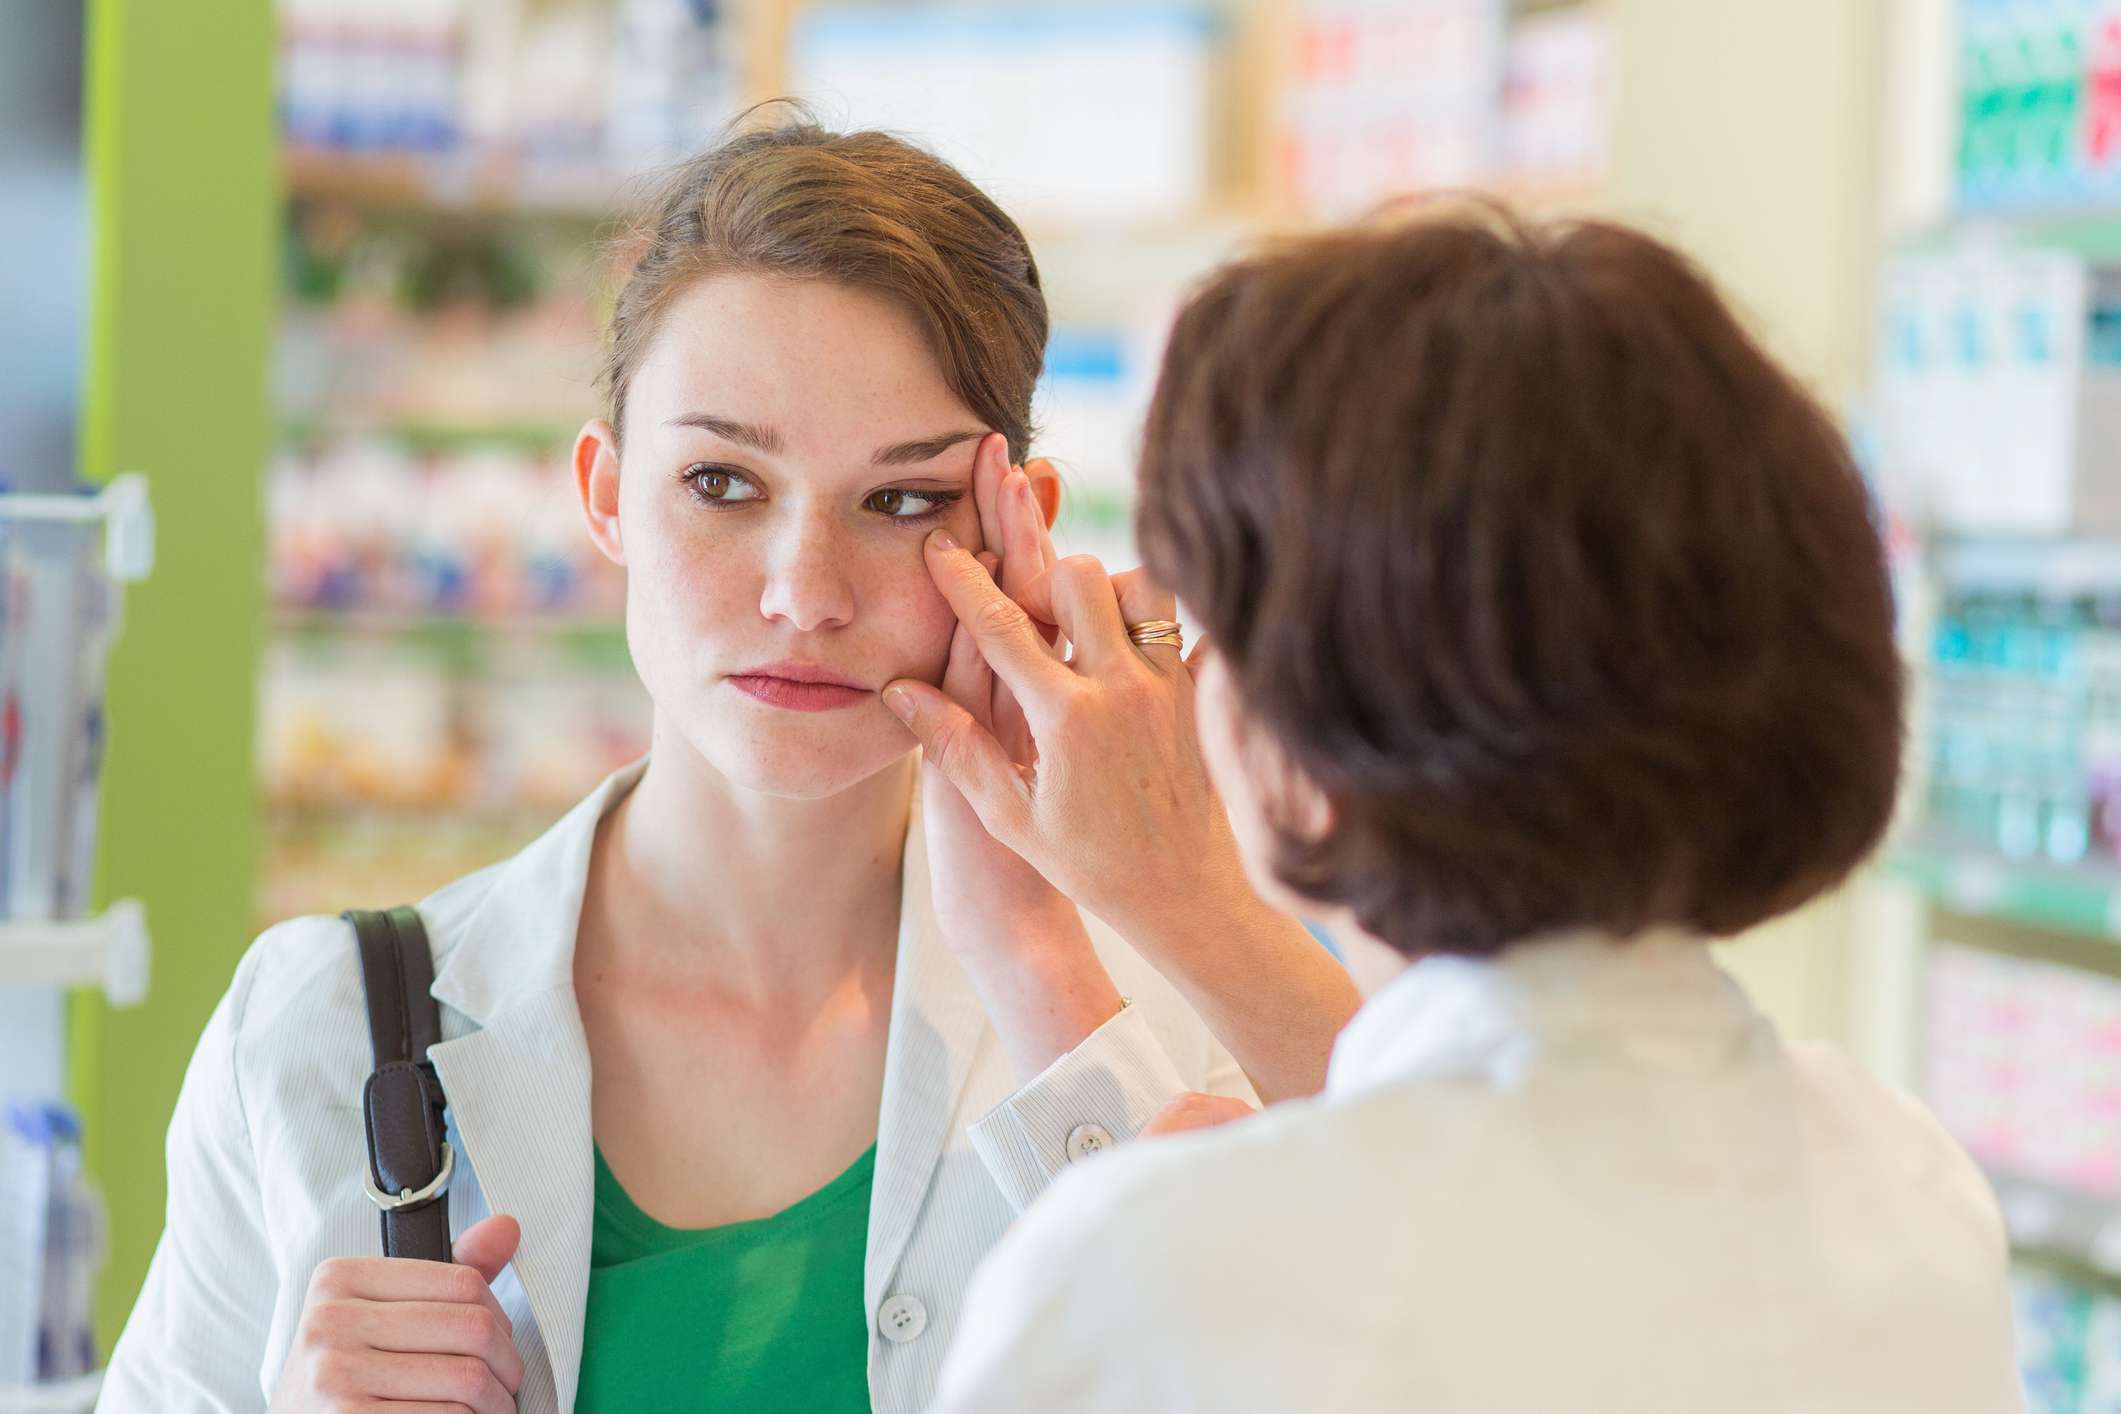 Pharmacist examining womans eye